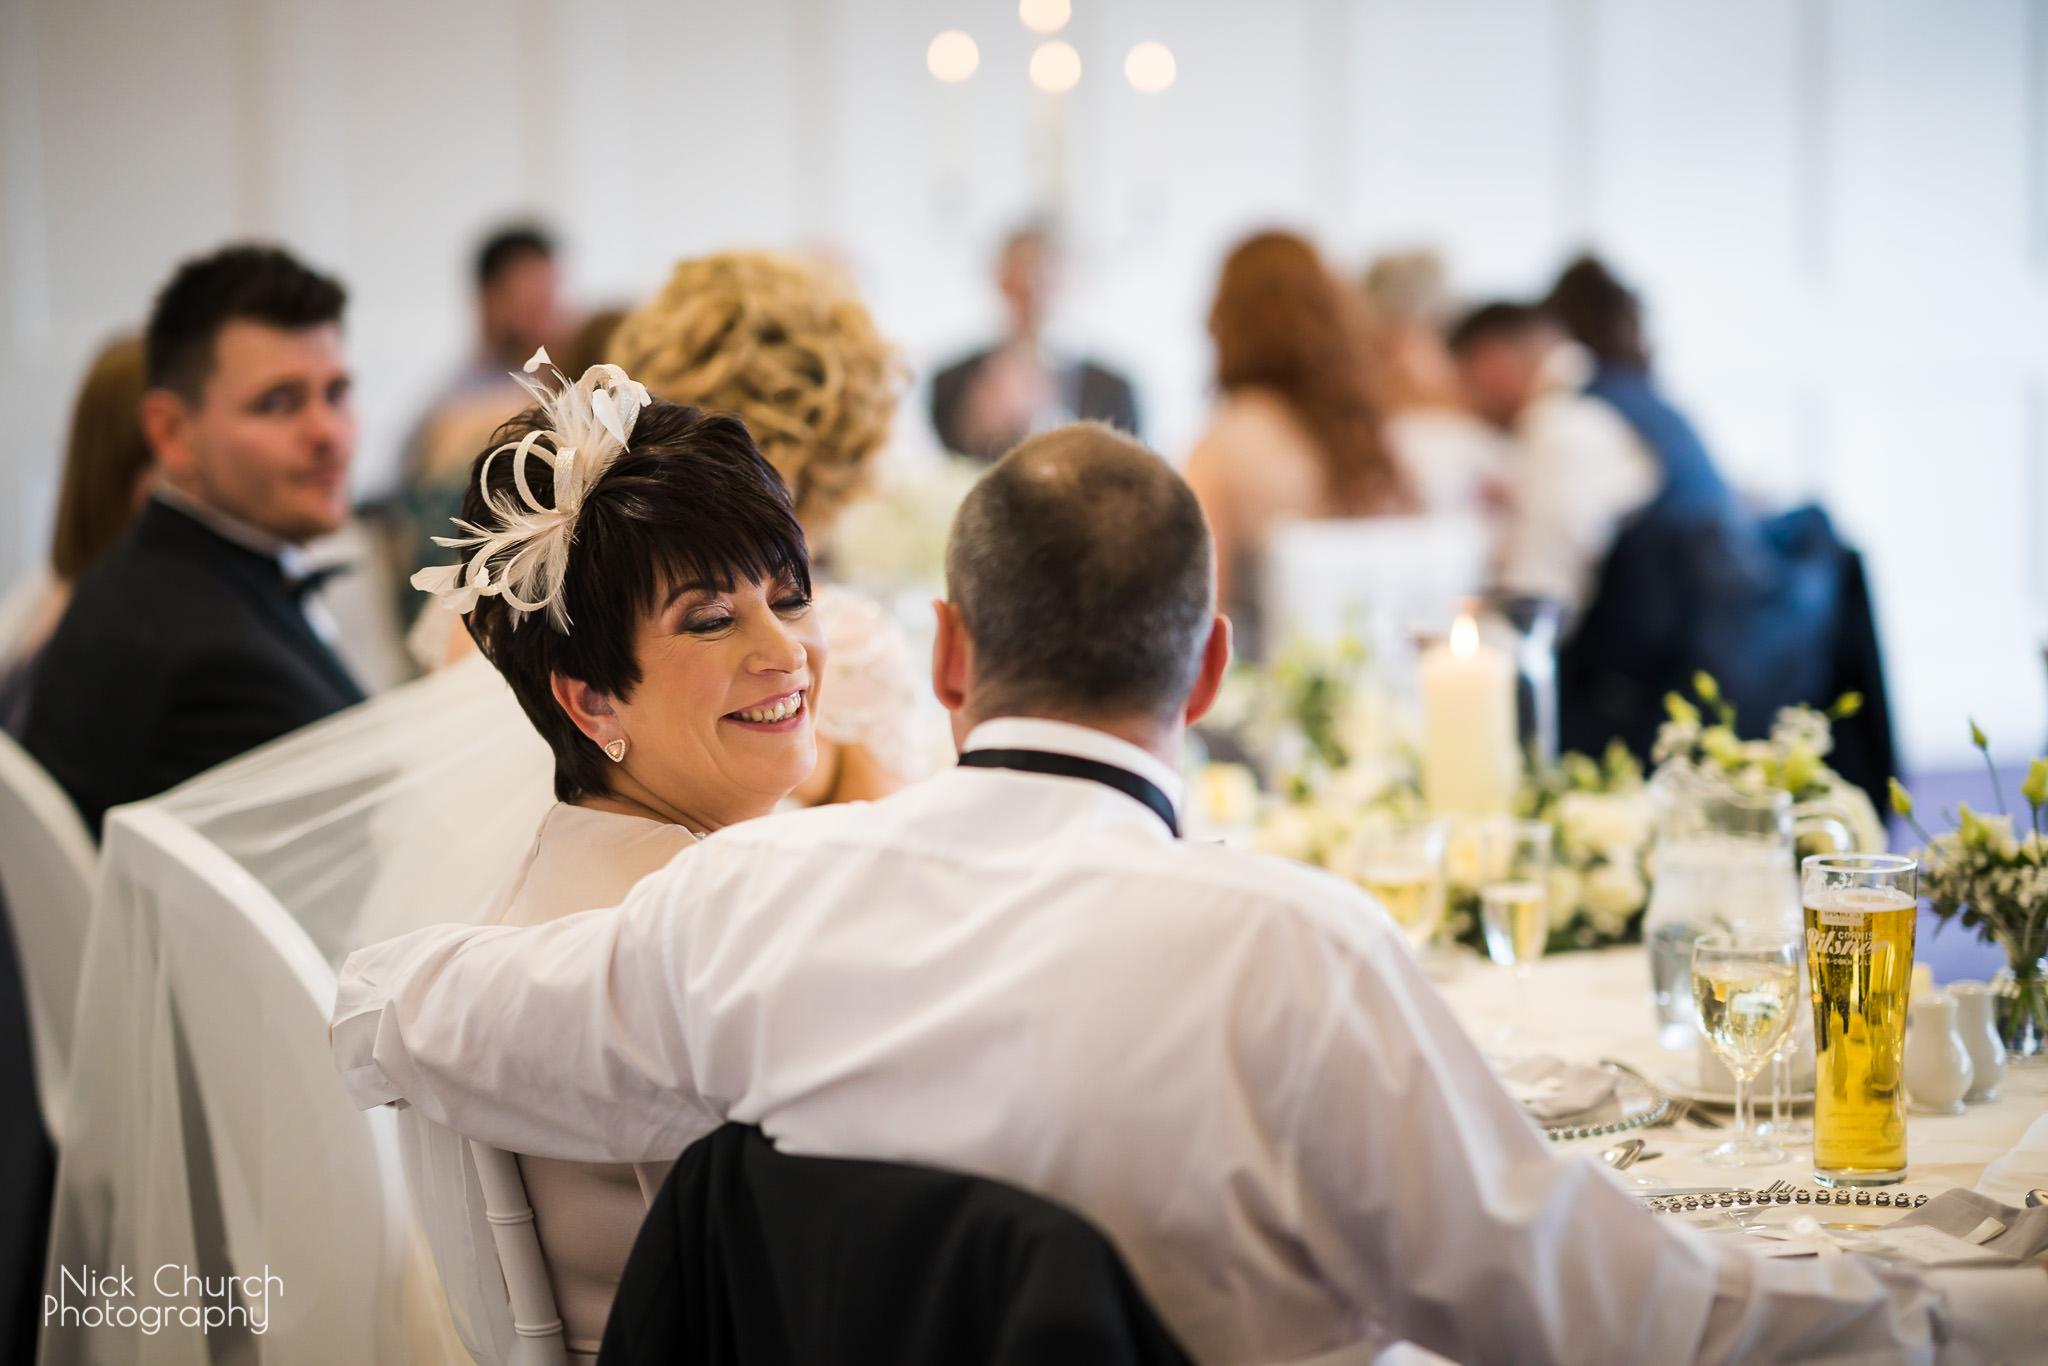 NC-20180317-stacy-and-mike-wedding-1687.jpg